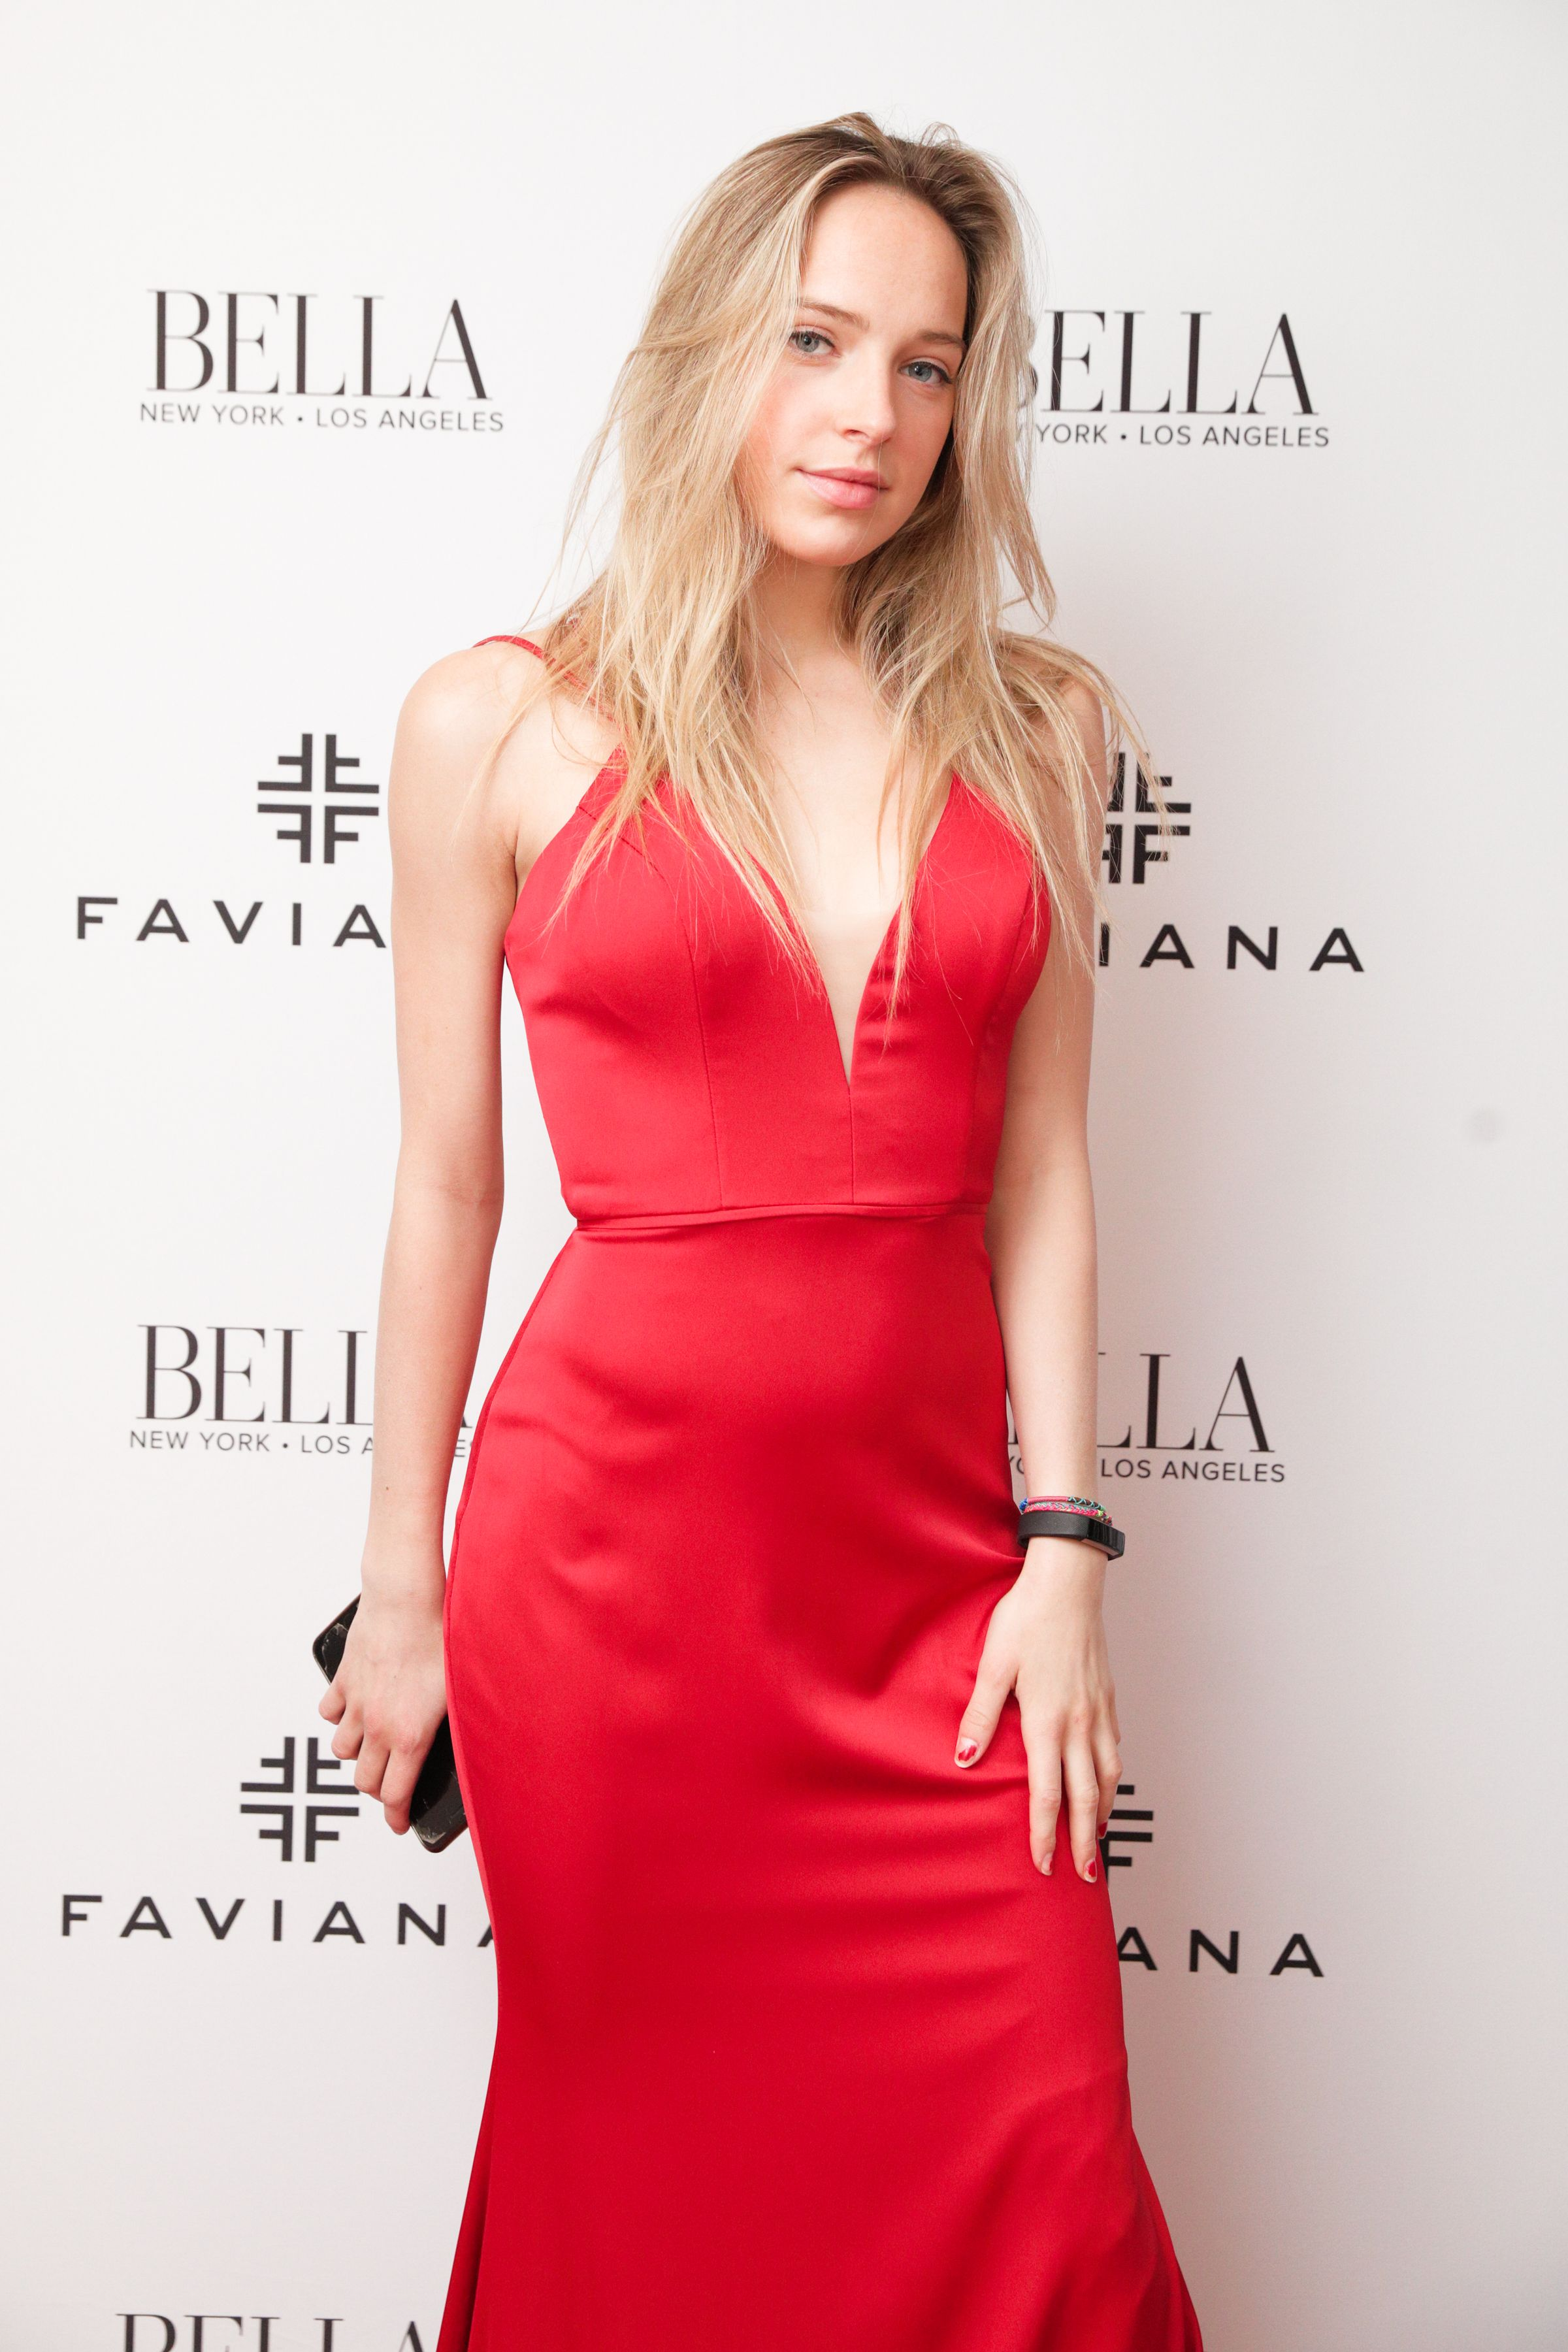 63fc422f3f Faviana's exclusive East Coast Oscar event on the rooftop of 75 Wall  Street. #faviana #oscars #nyc #eastcoastoscars #redcarpet